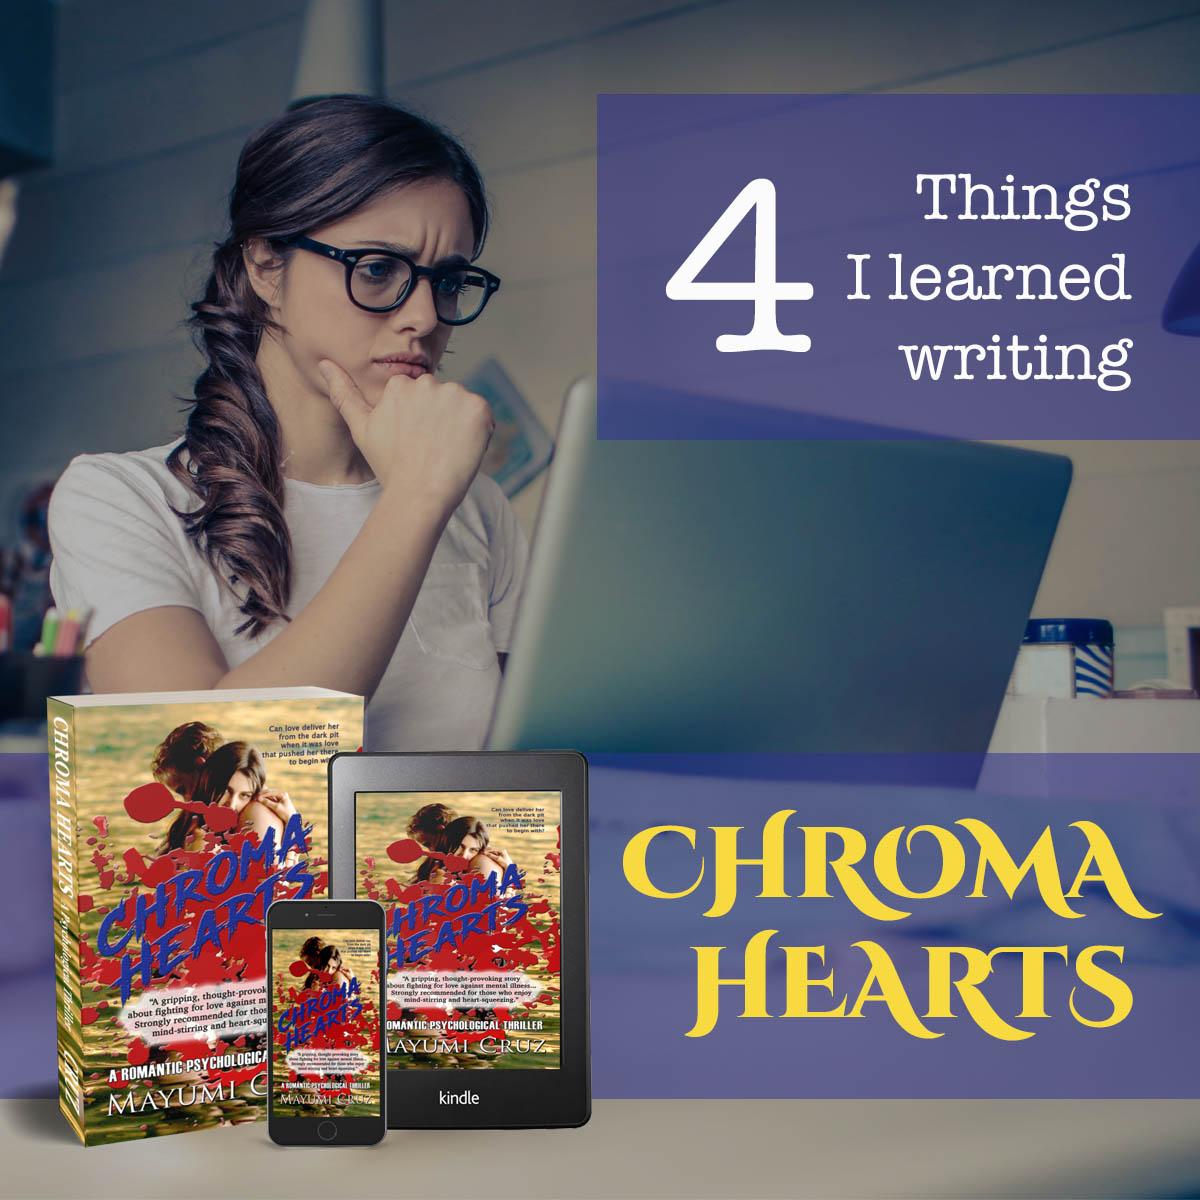 4 Major Things I Learned Writing CHROMA HEARTS